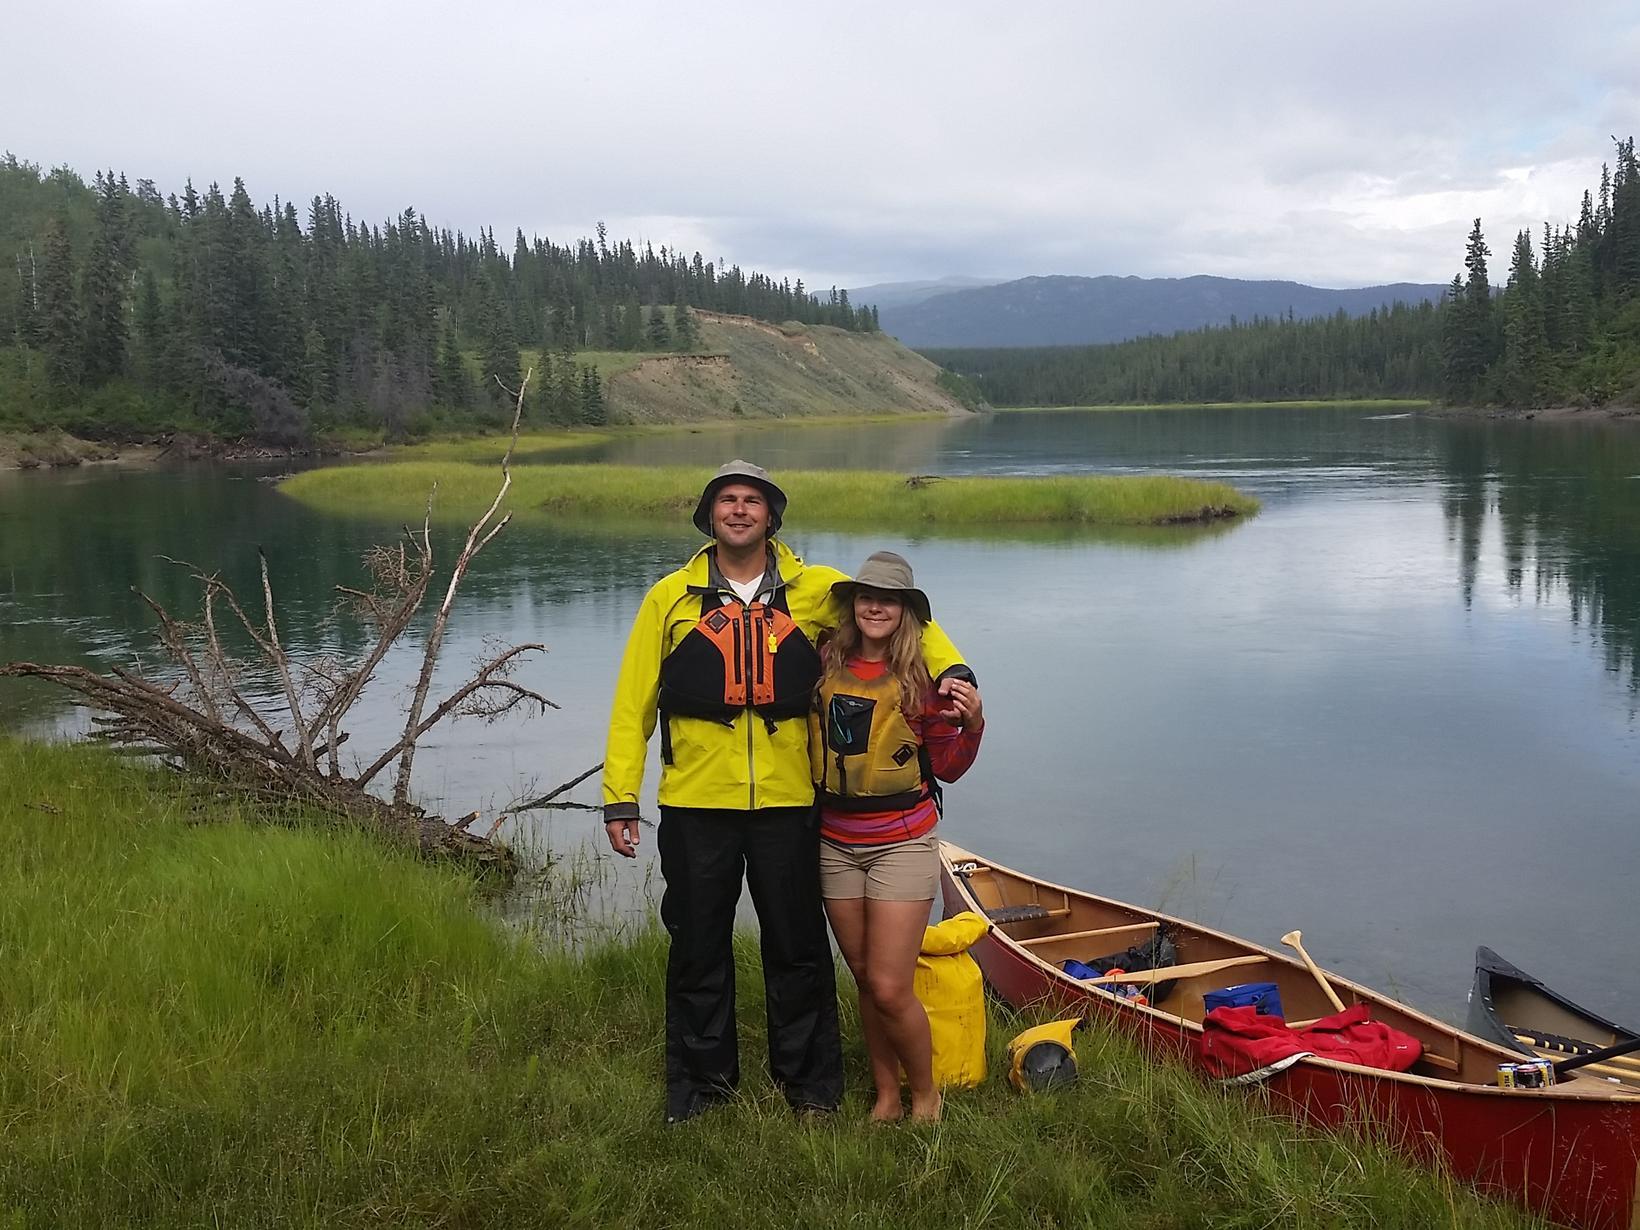 Ashley & Craig from Whitehorse, Yukon, Canada